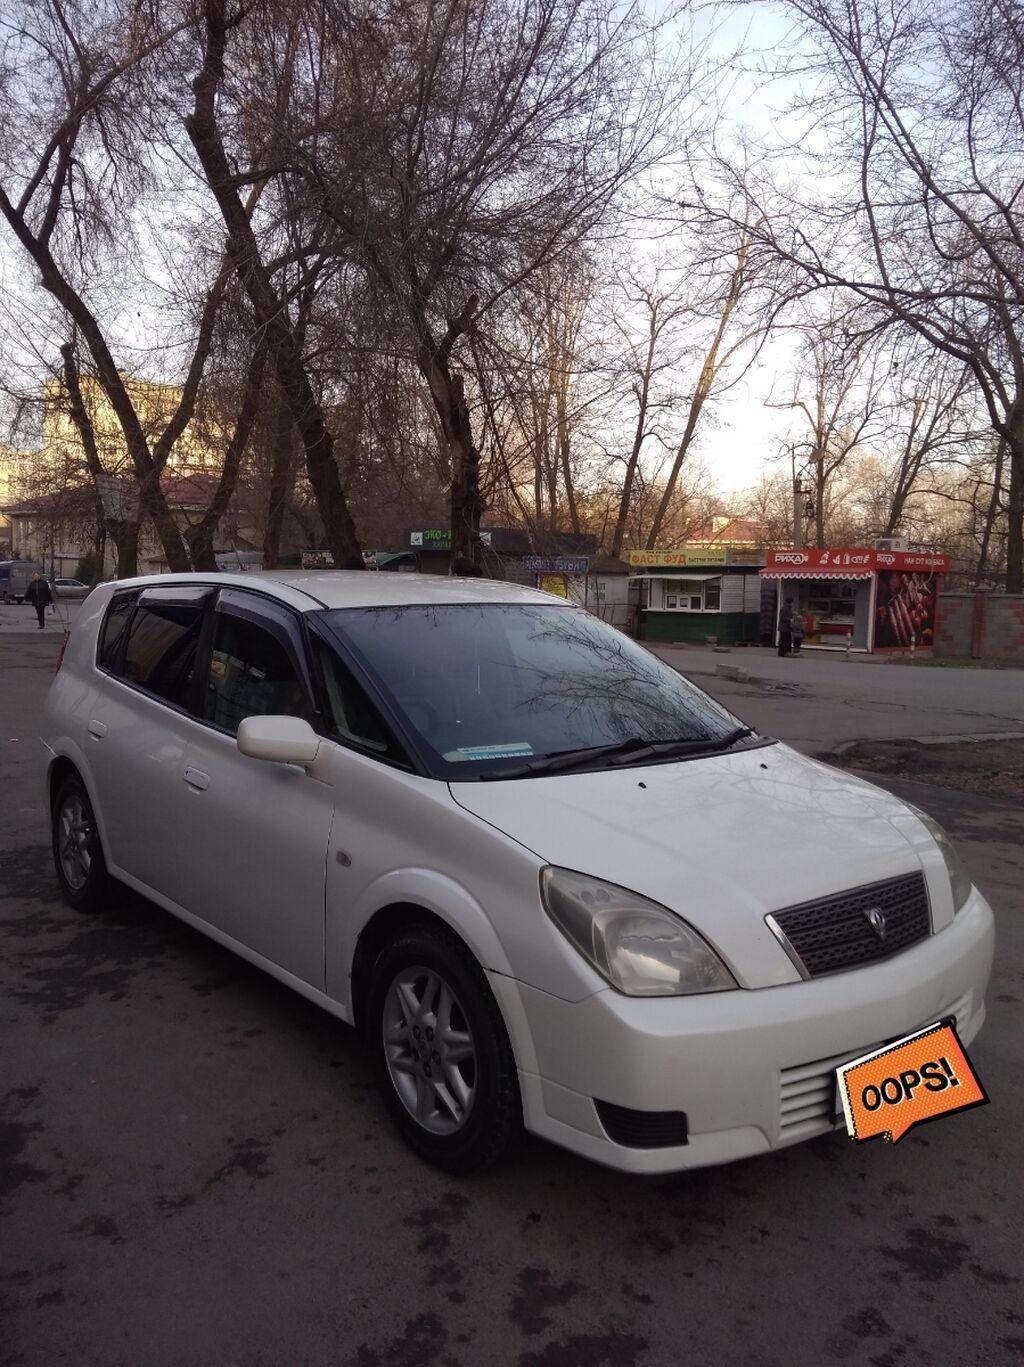 Toyota Opa 1.8 л. 2002 | 167630 км: Toyota Opa 1.8 л. 2002 | 167630 км